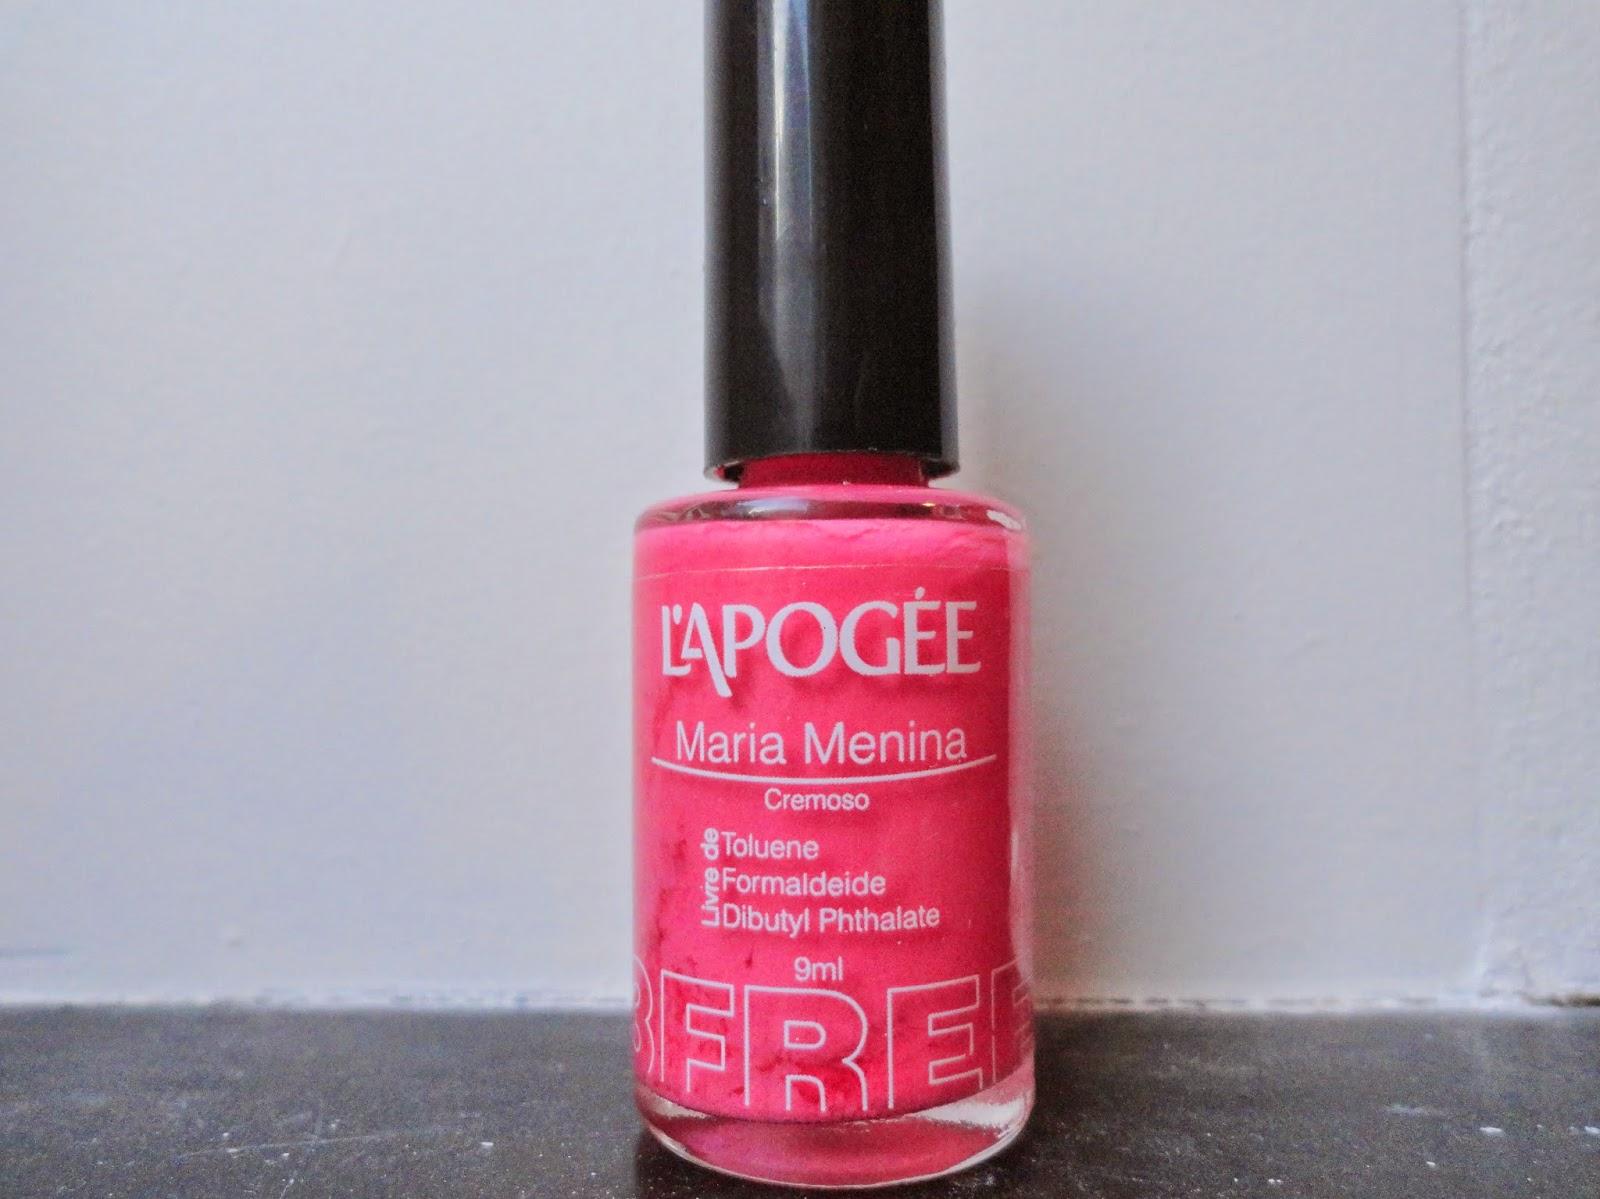 Clothes & Dreams: NOTD: Filled neon triangle: neon pink nail polish L'Apogee Maria Menina cremoso